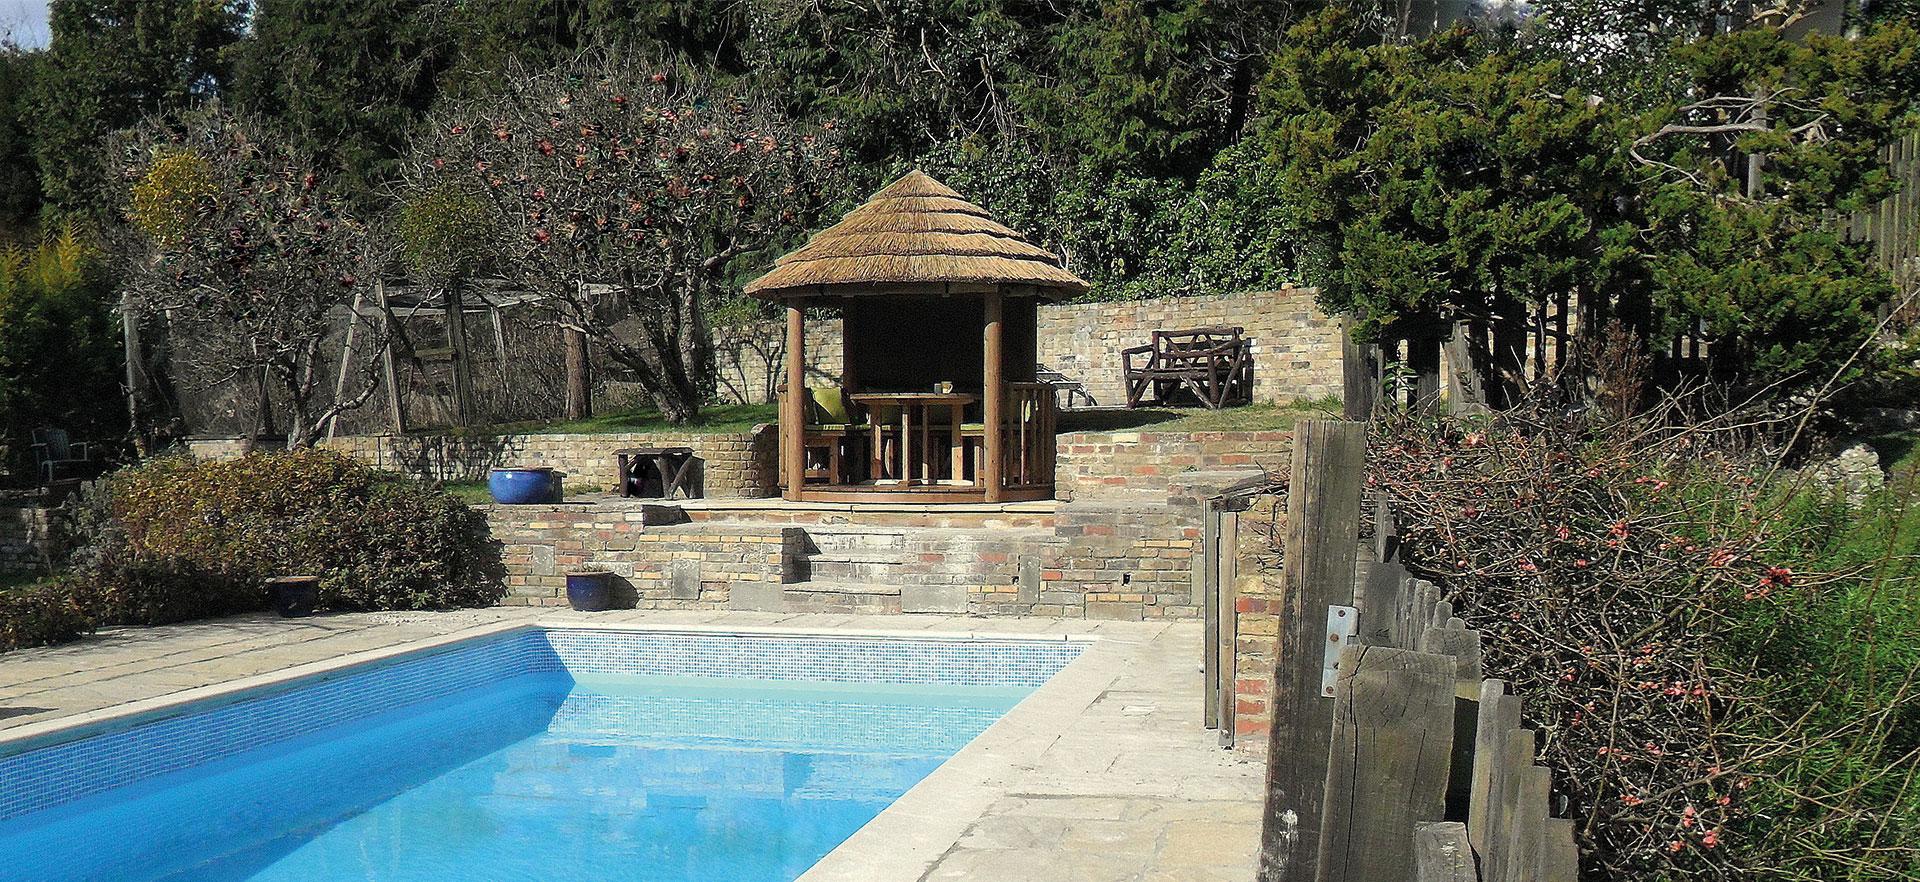 2.5 metre gazebo overlooking outdoor swimming pool